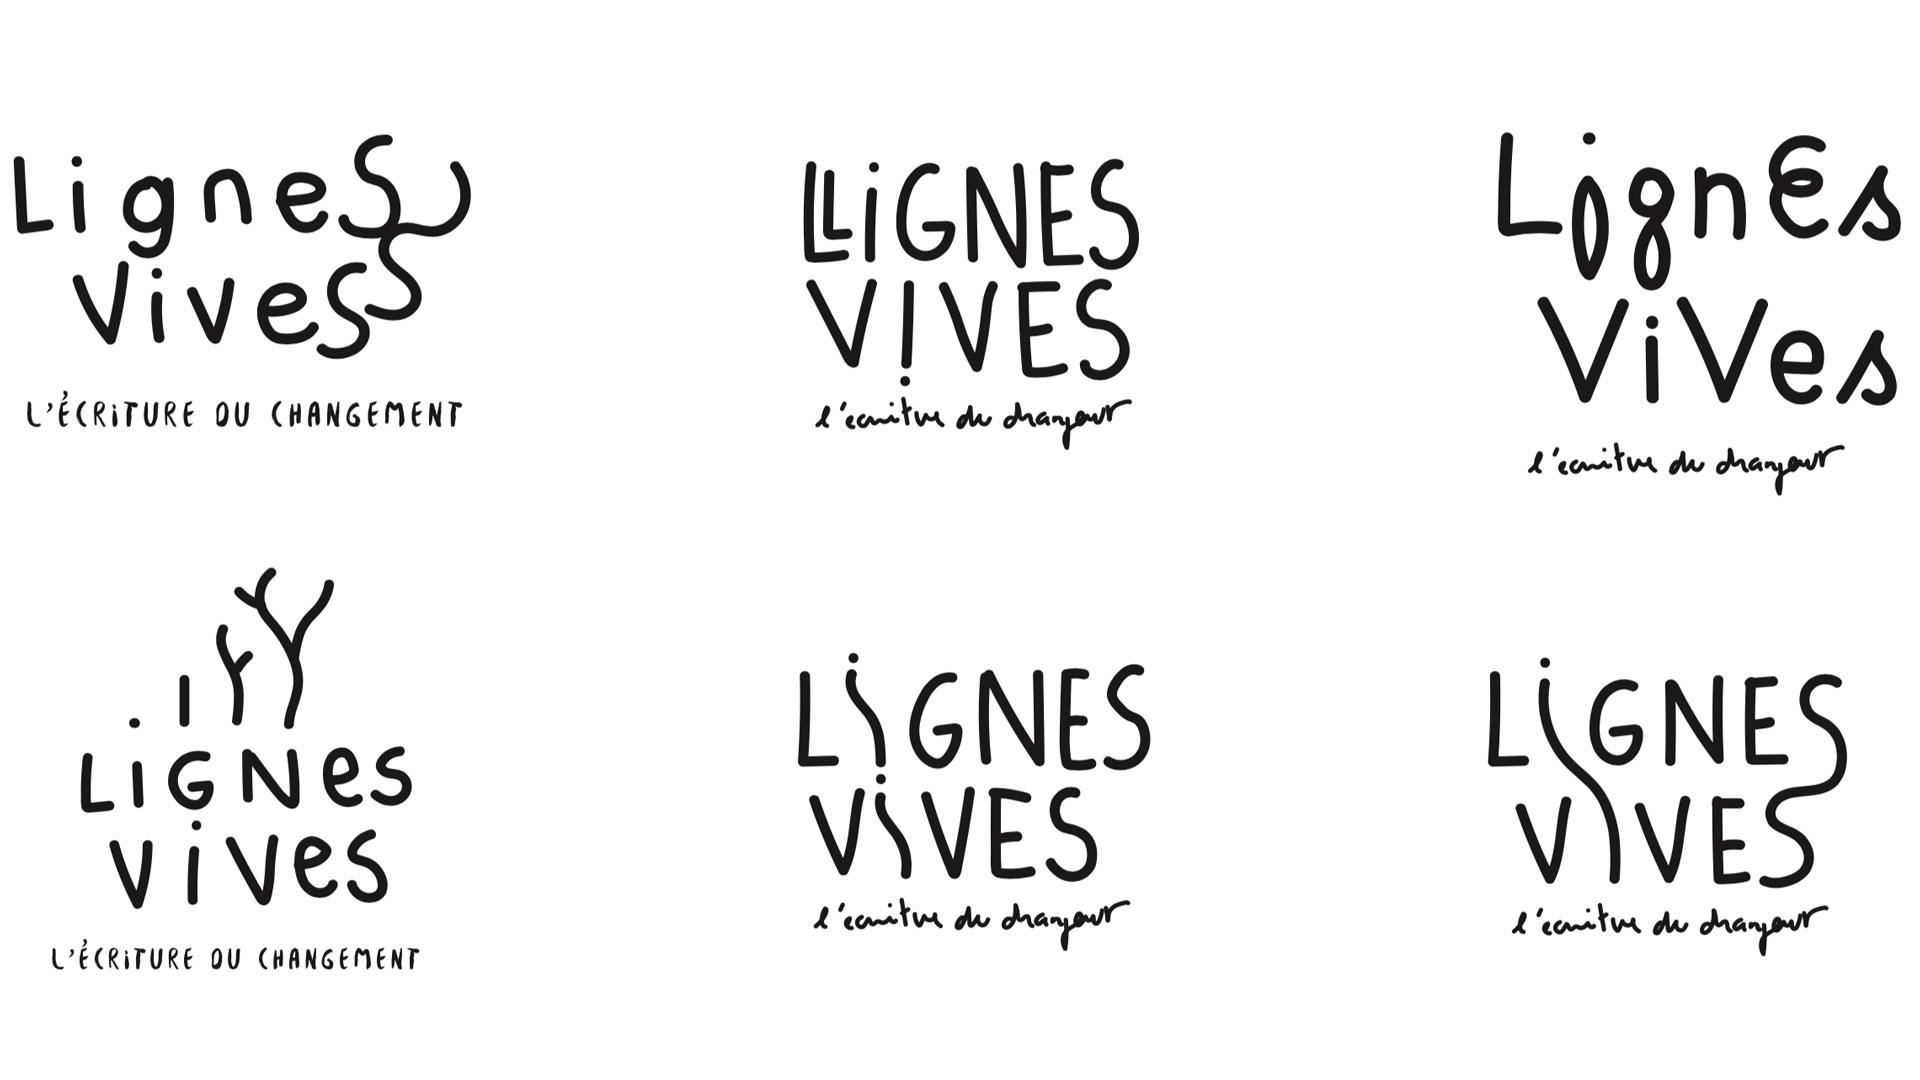 Lignes Vives Identite Visuelle Logo Esquisse